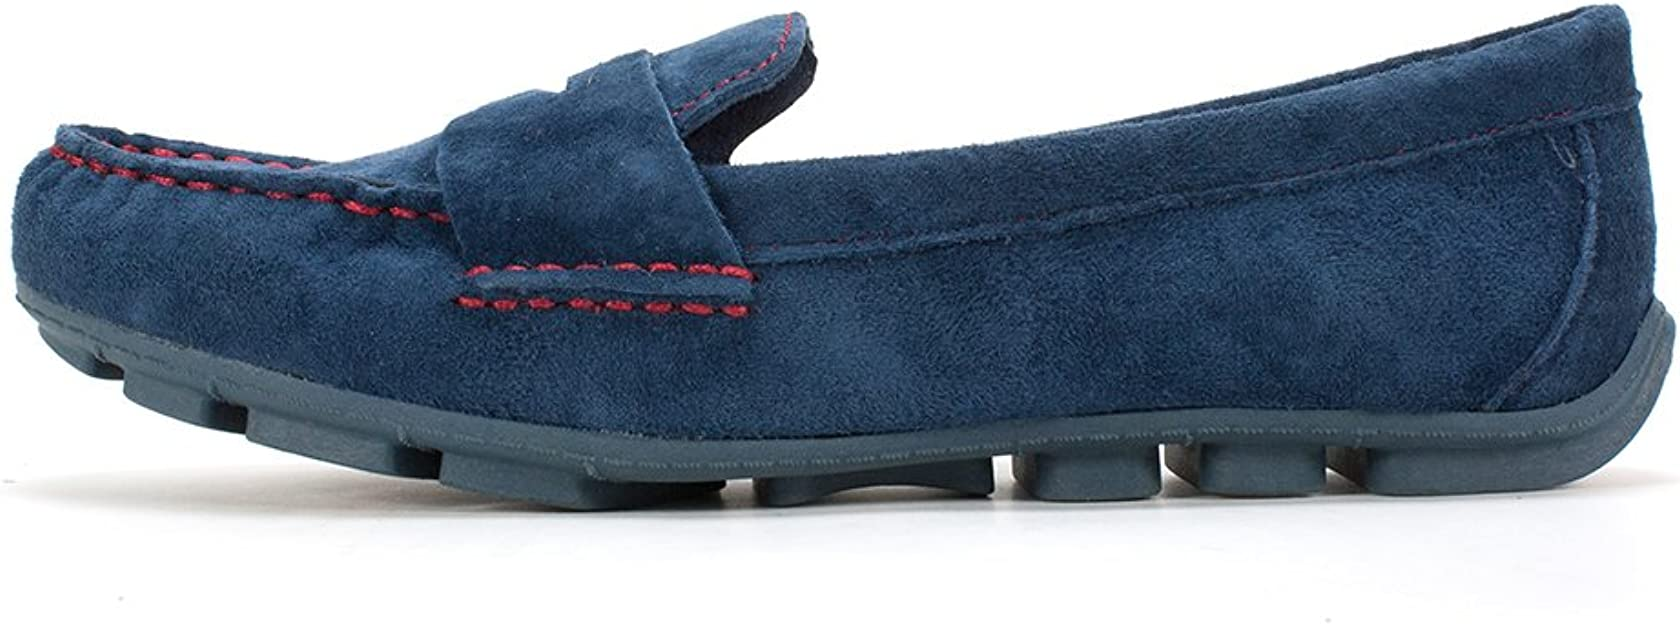 Details about  /WHITE MOUNTAIN Shoes Seeker Women/'s Flat